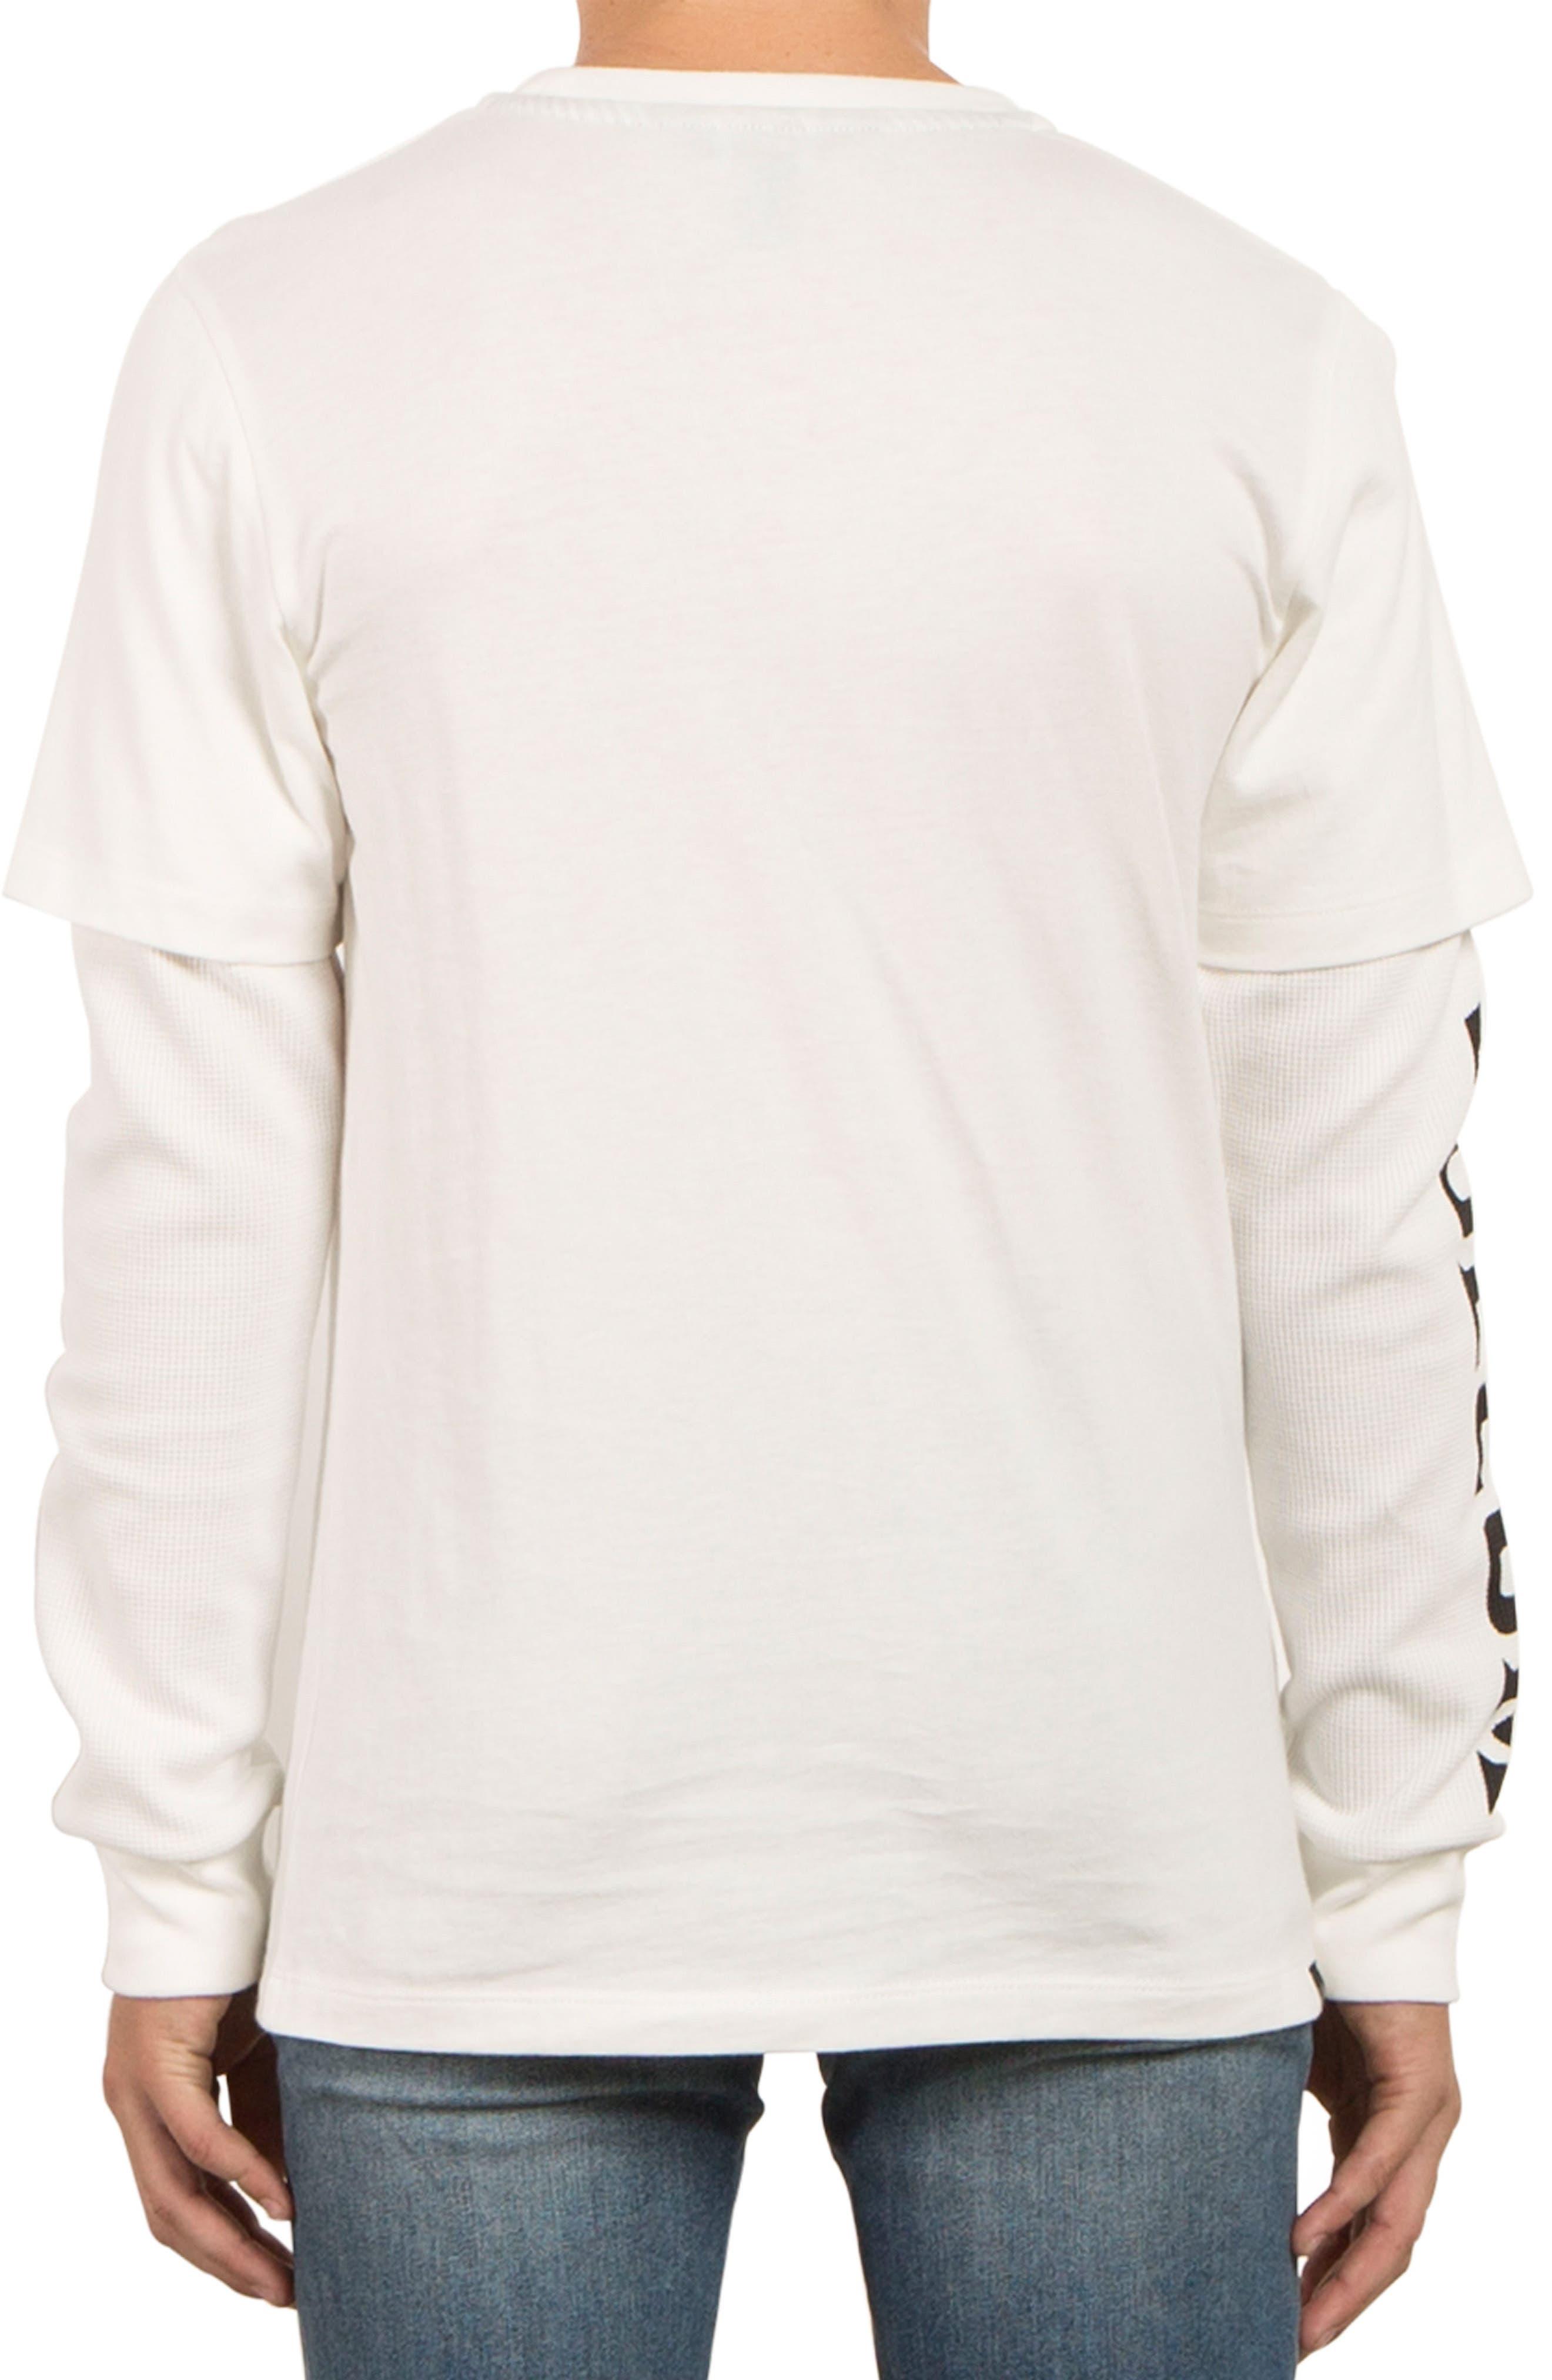 Alternate Image 2  - Volcom Easton Long Sleeve T-Shirt (Big Boys)